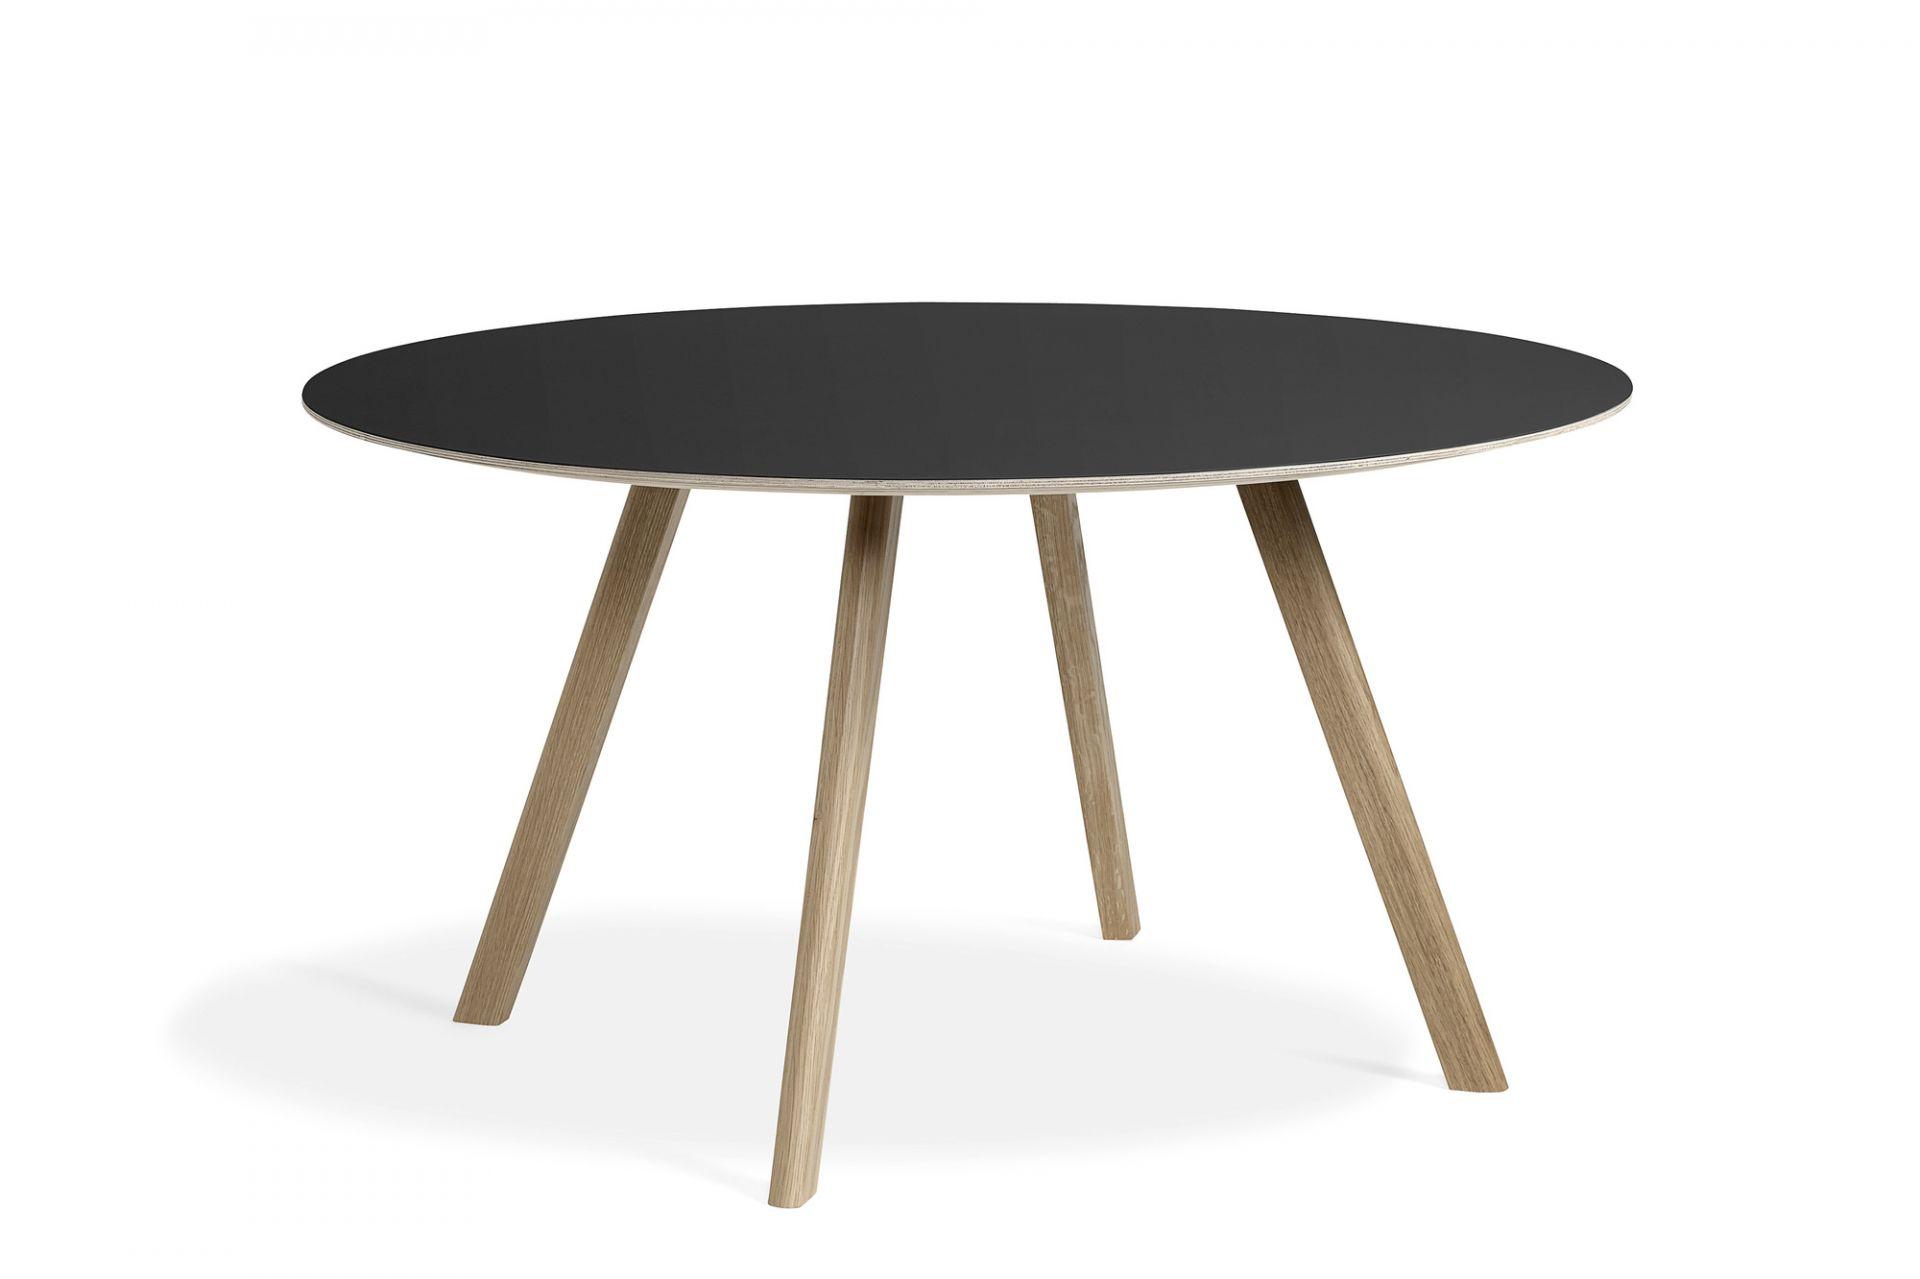 Copenhague Table Cph 25 Tisch Rund O 140 Cm Hay Hay Cph 20 D 140 Cm